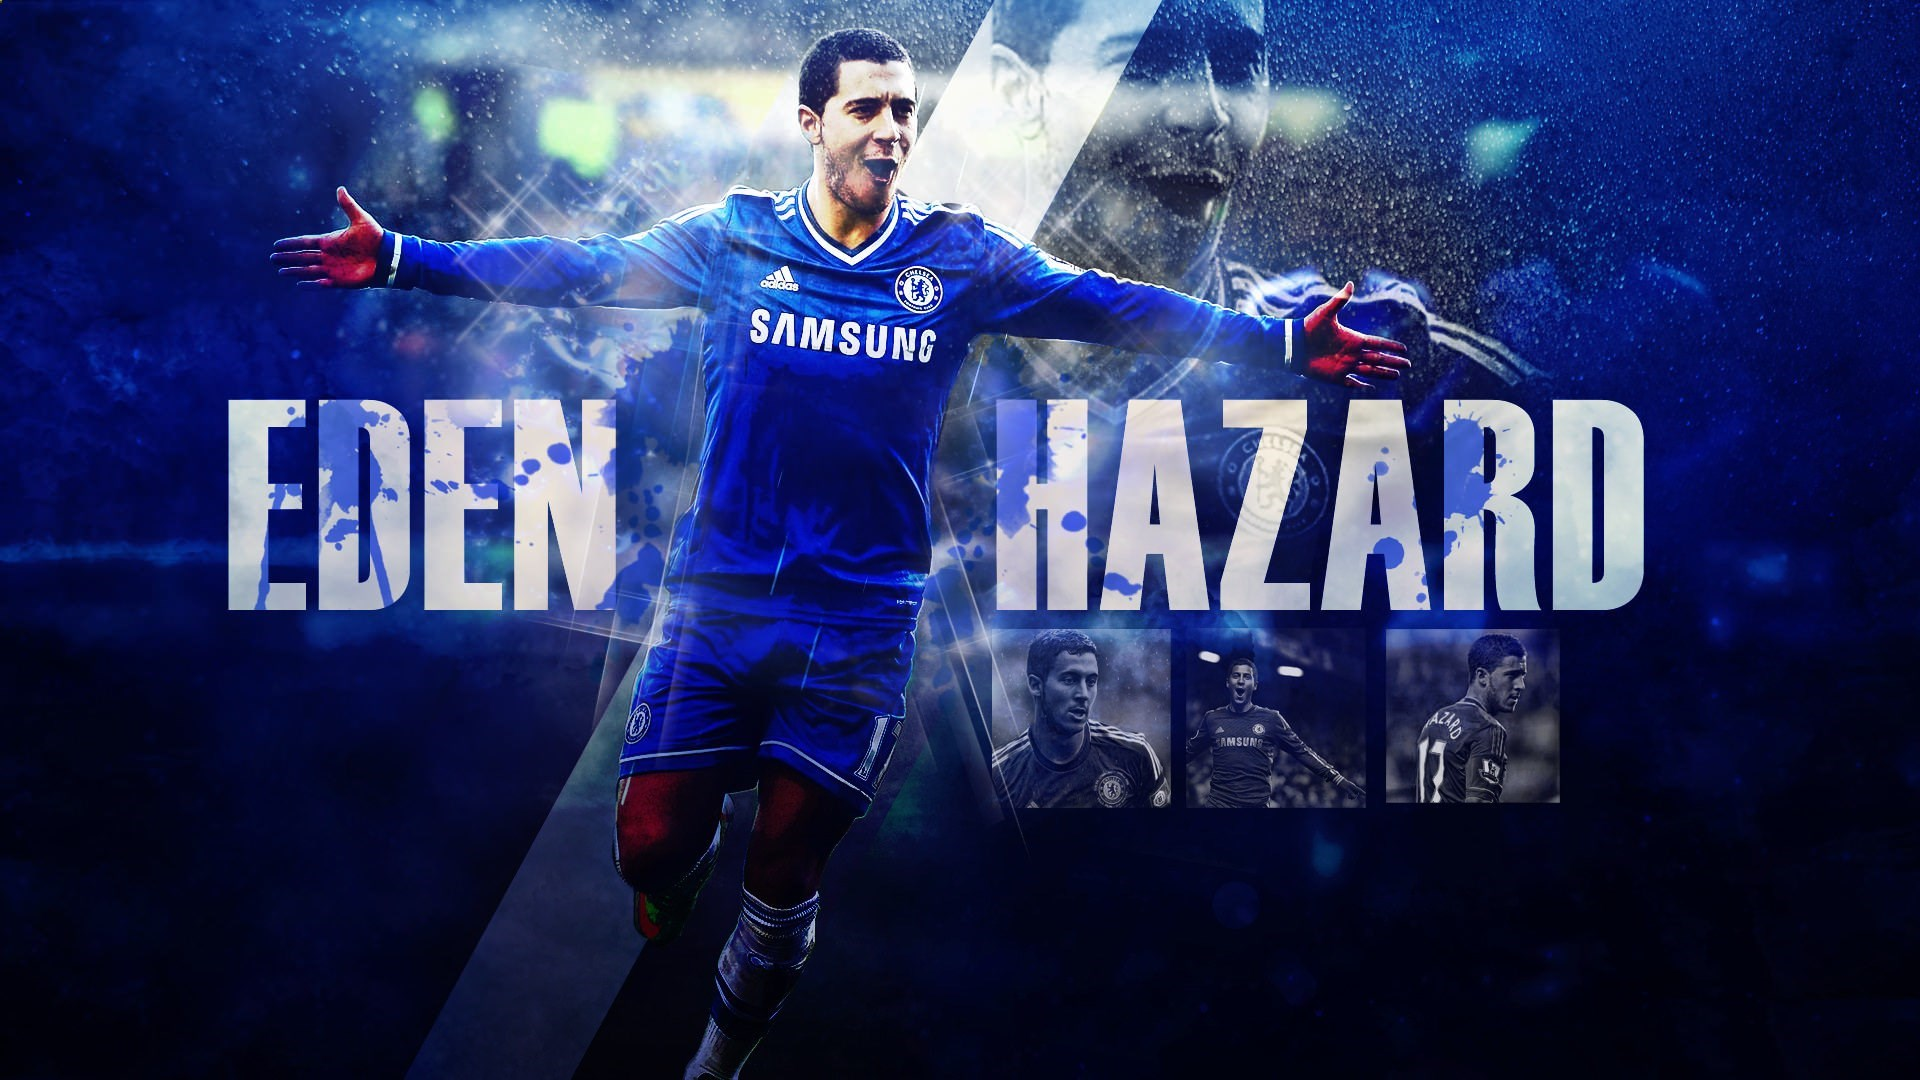 Eden-Michael-Hazard-is-a-Belgian-professional-footballer-who-plays-for-Chelsea-and-the-Belgium-natio-wallpaper-wpc9004636